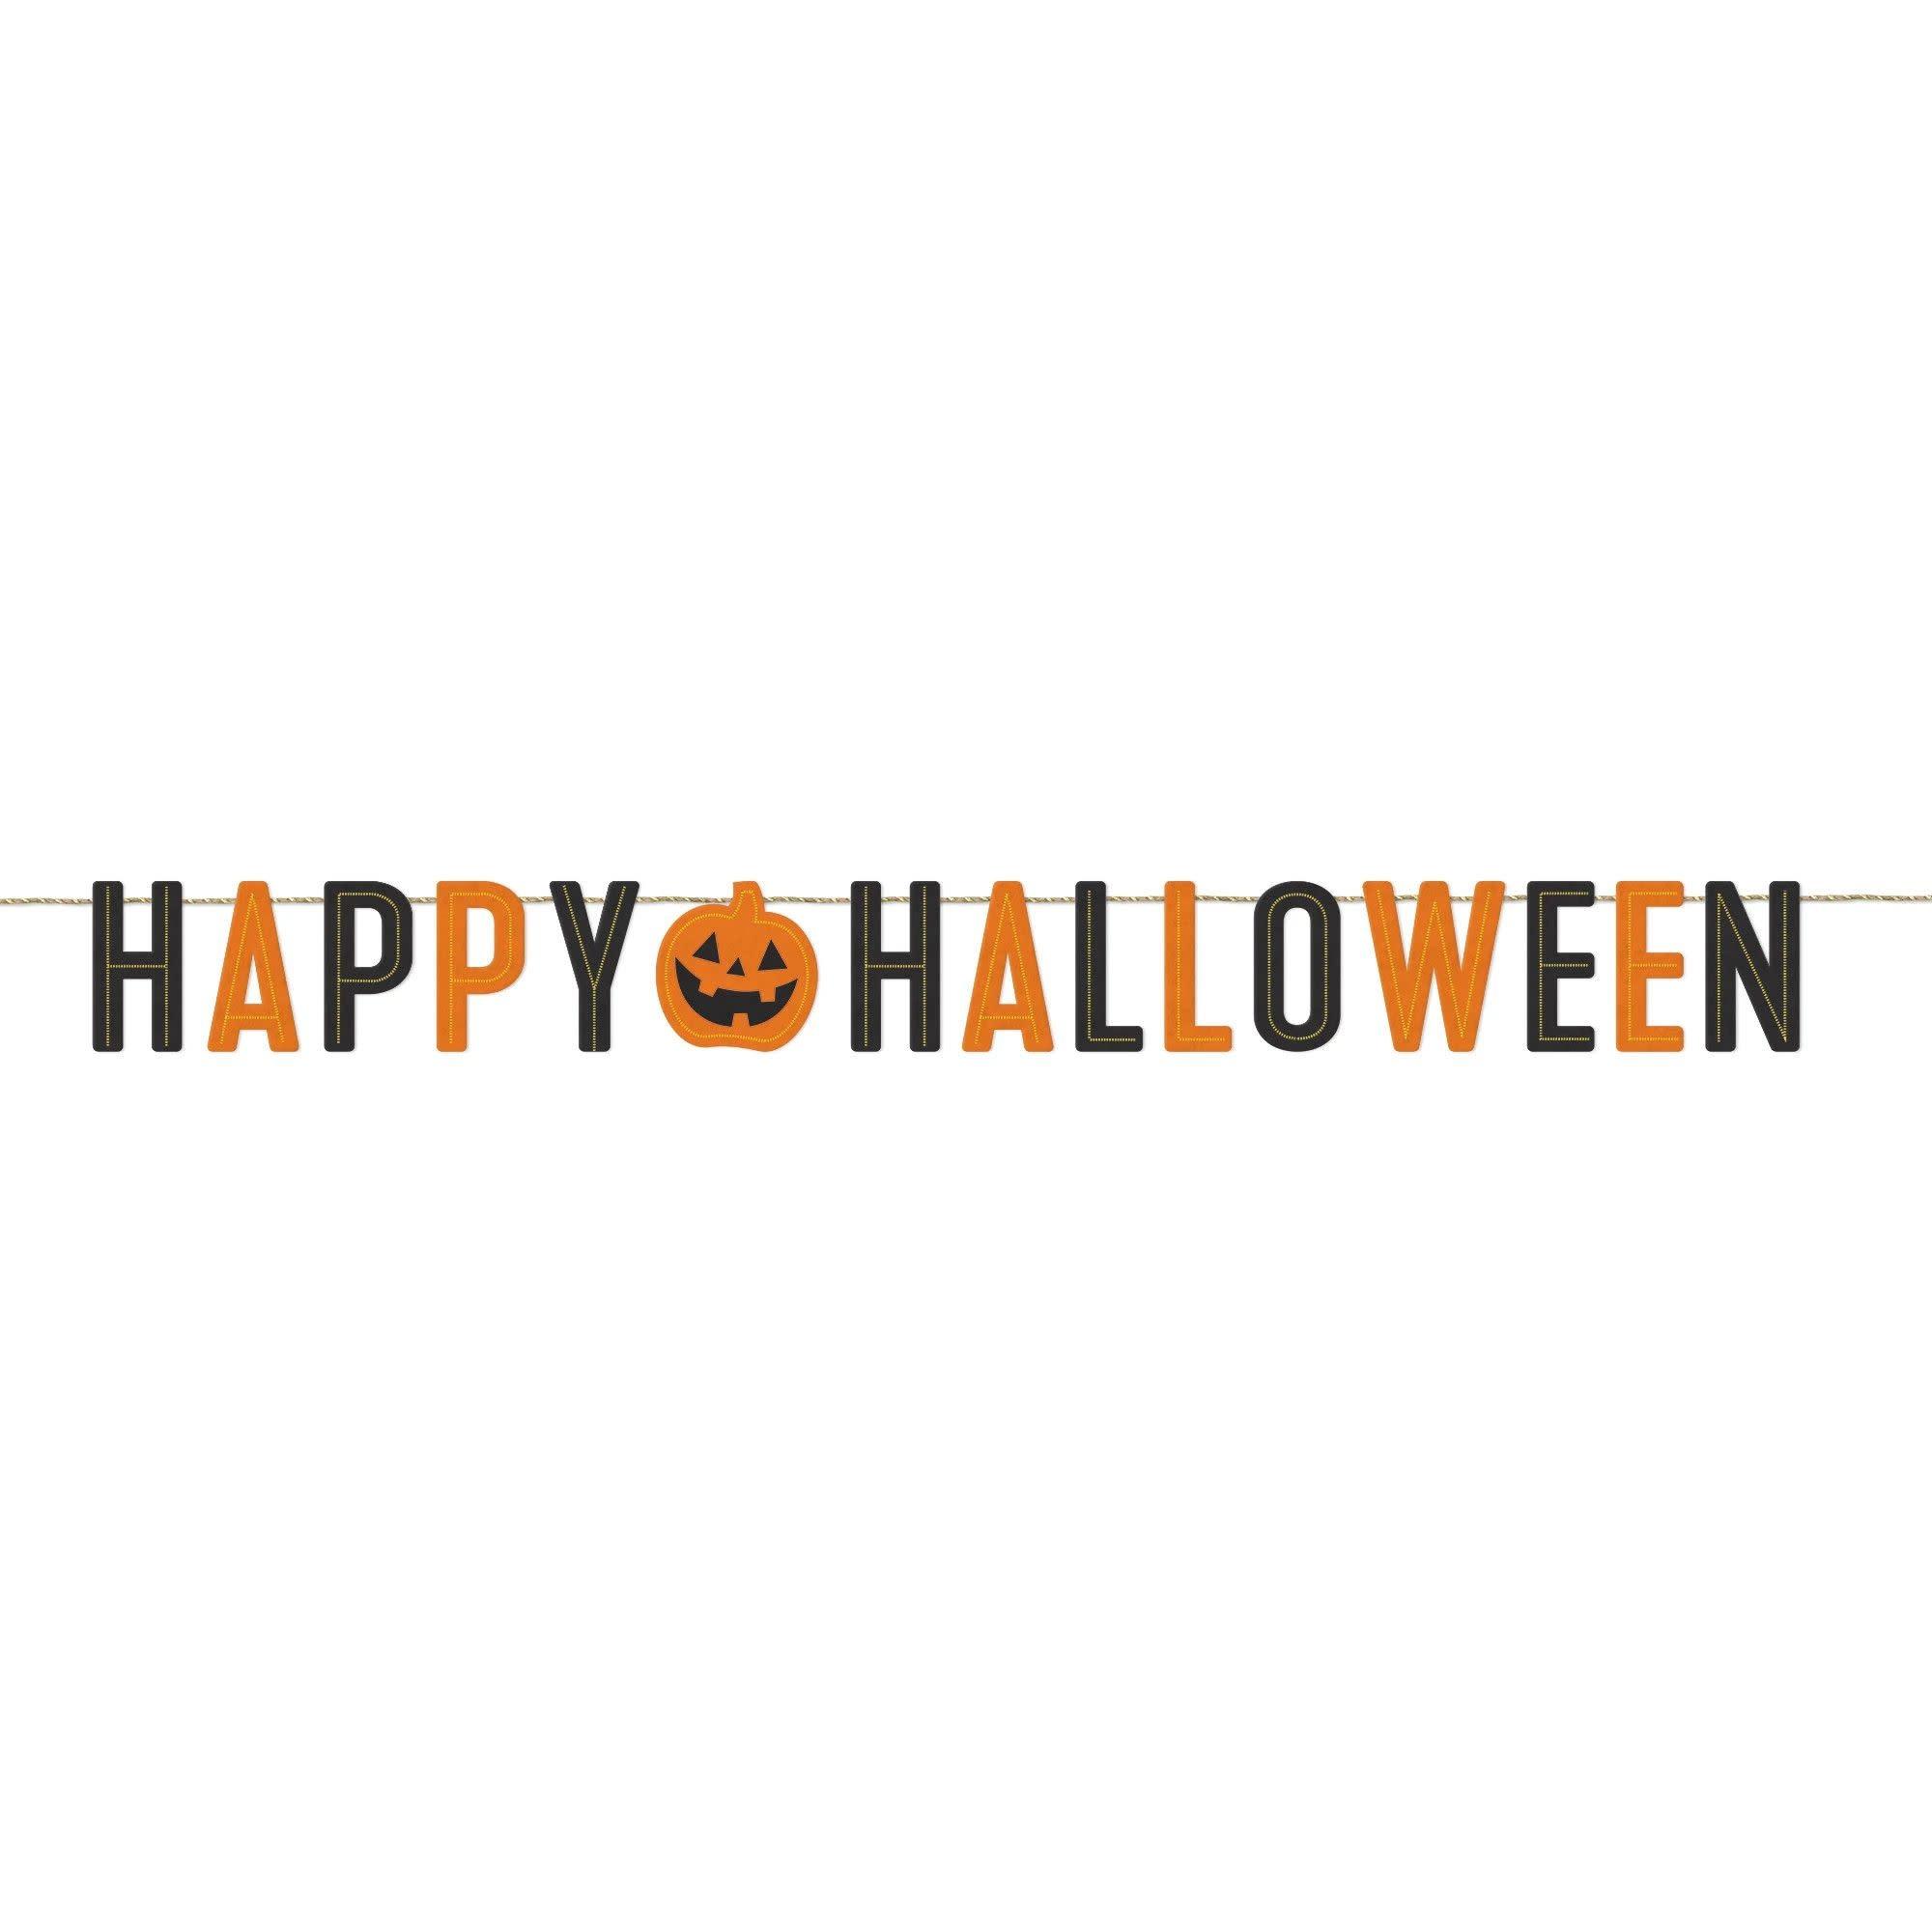 Classic Orange & Black Halloween Felt Banner